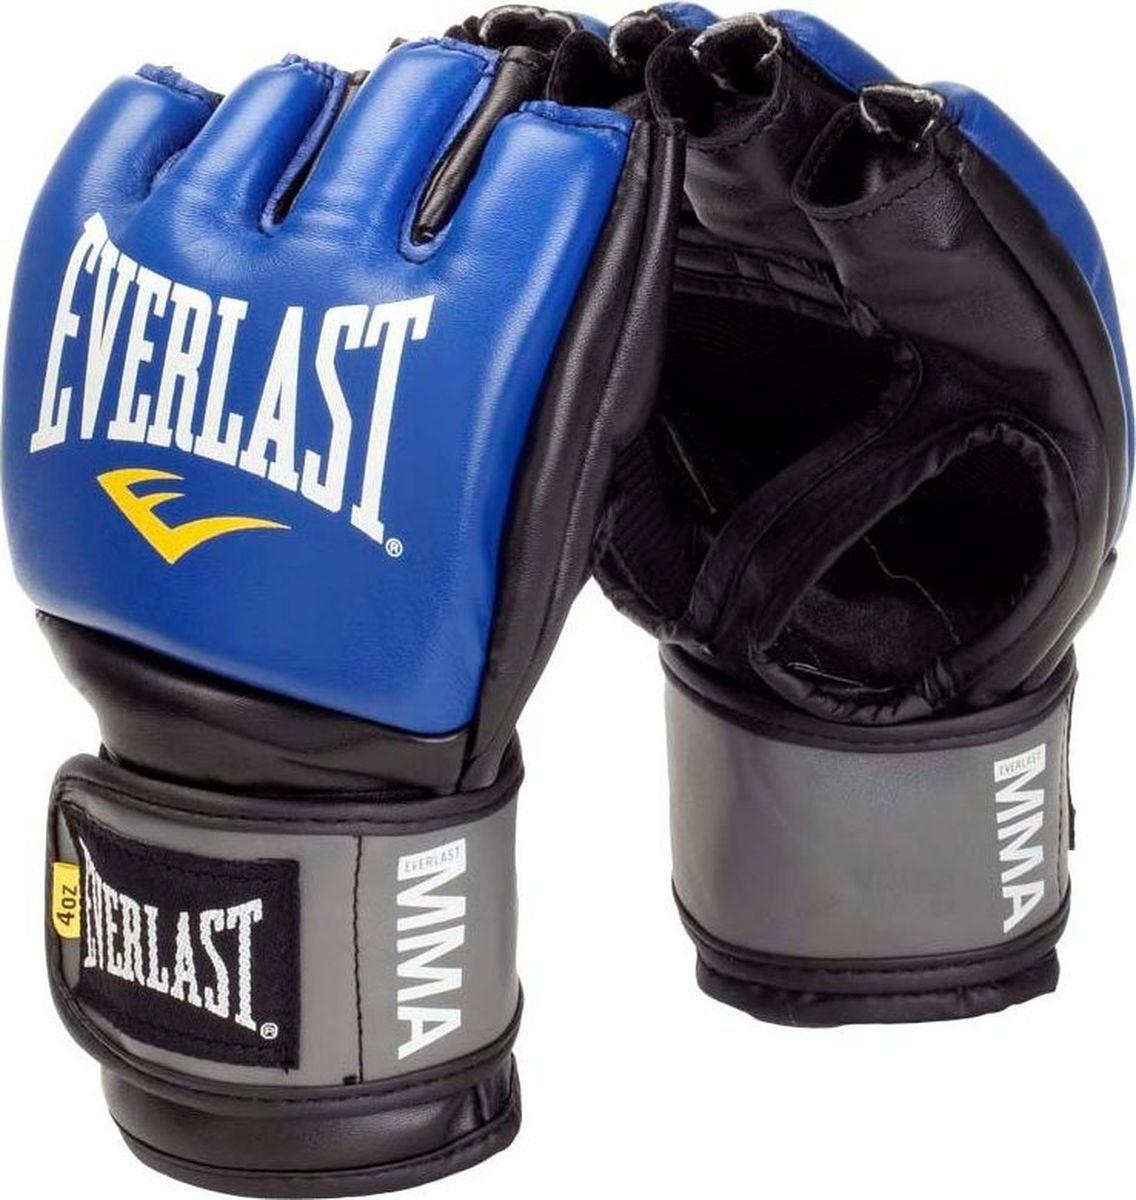 Перчатки для единоборств Everlast Pro Style Grappling, тренировочные, 7778RBLXLU, синий, размер L/XL перчатки тренировочные everlast pro style elite